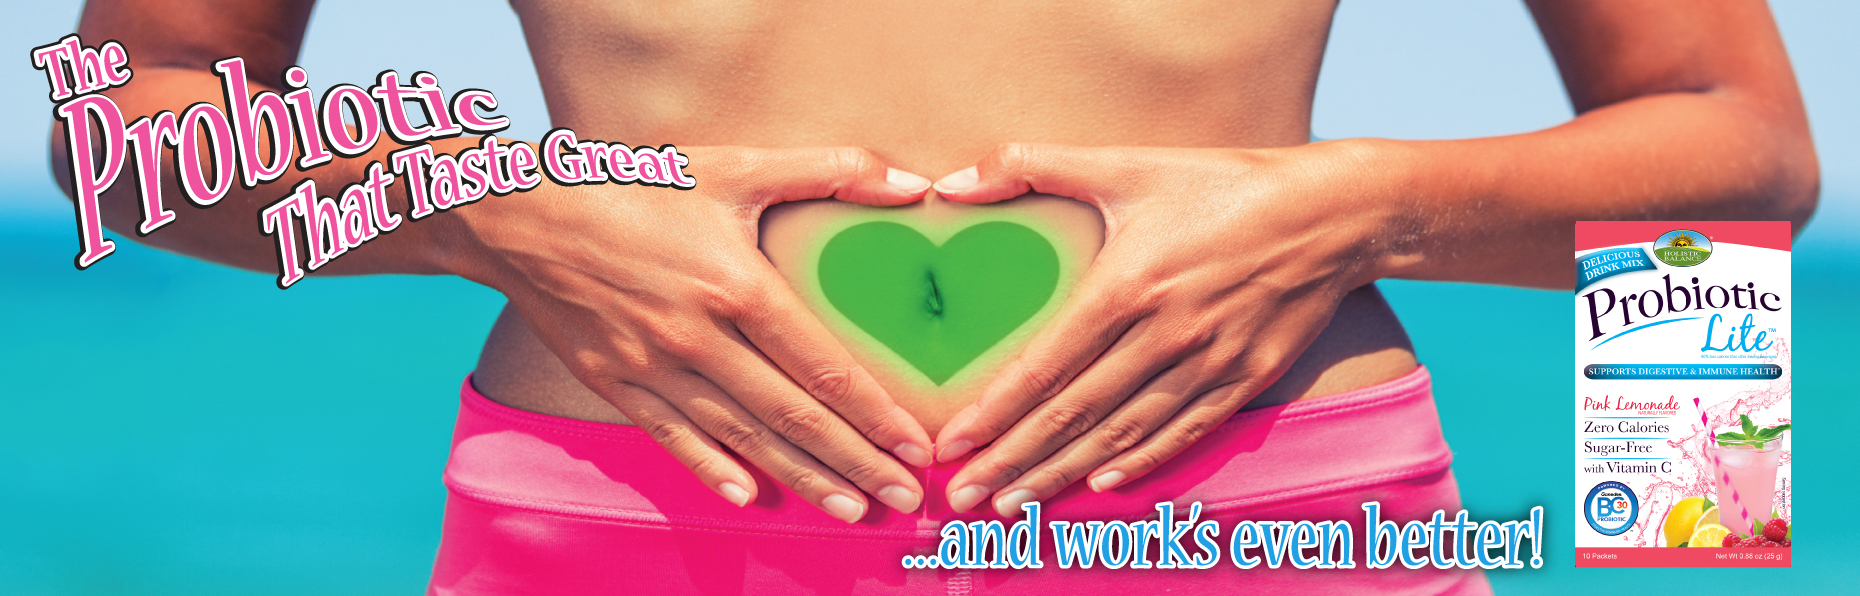 Probiotic-HB-Pink-banner.jpg